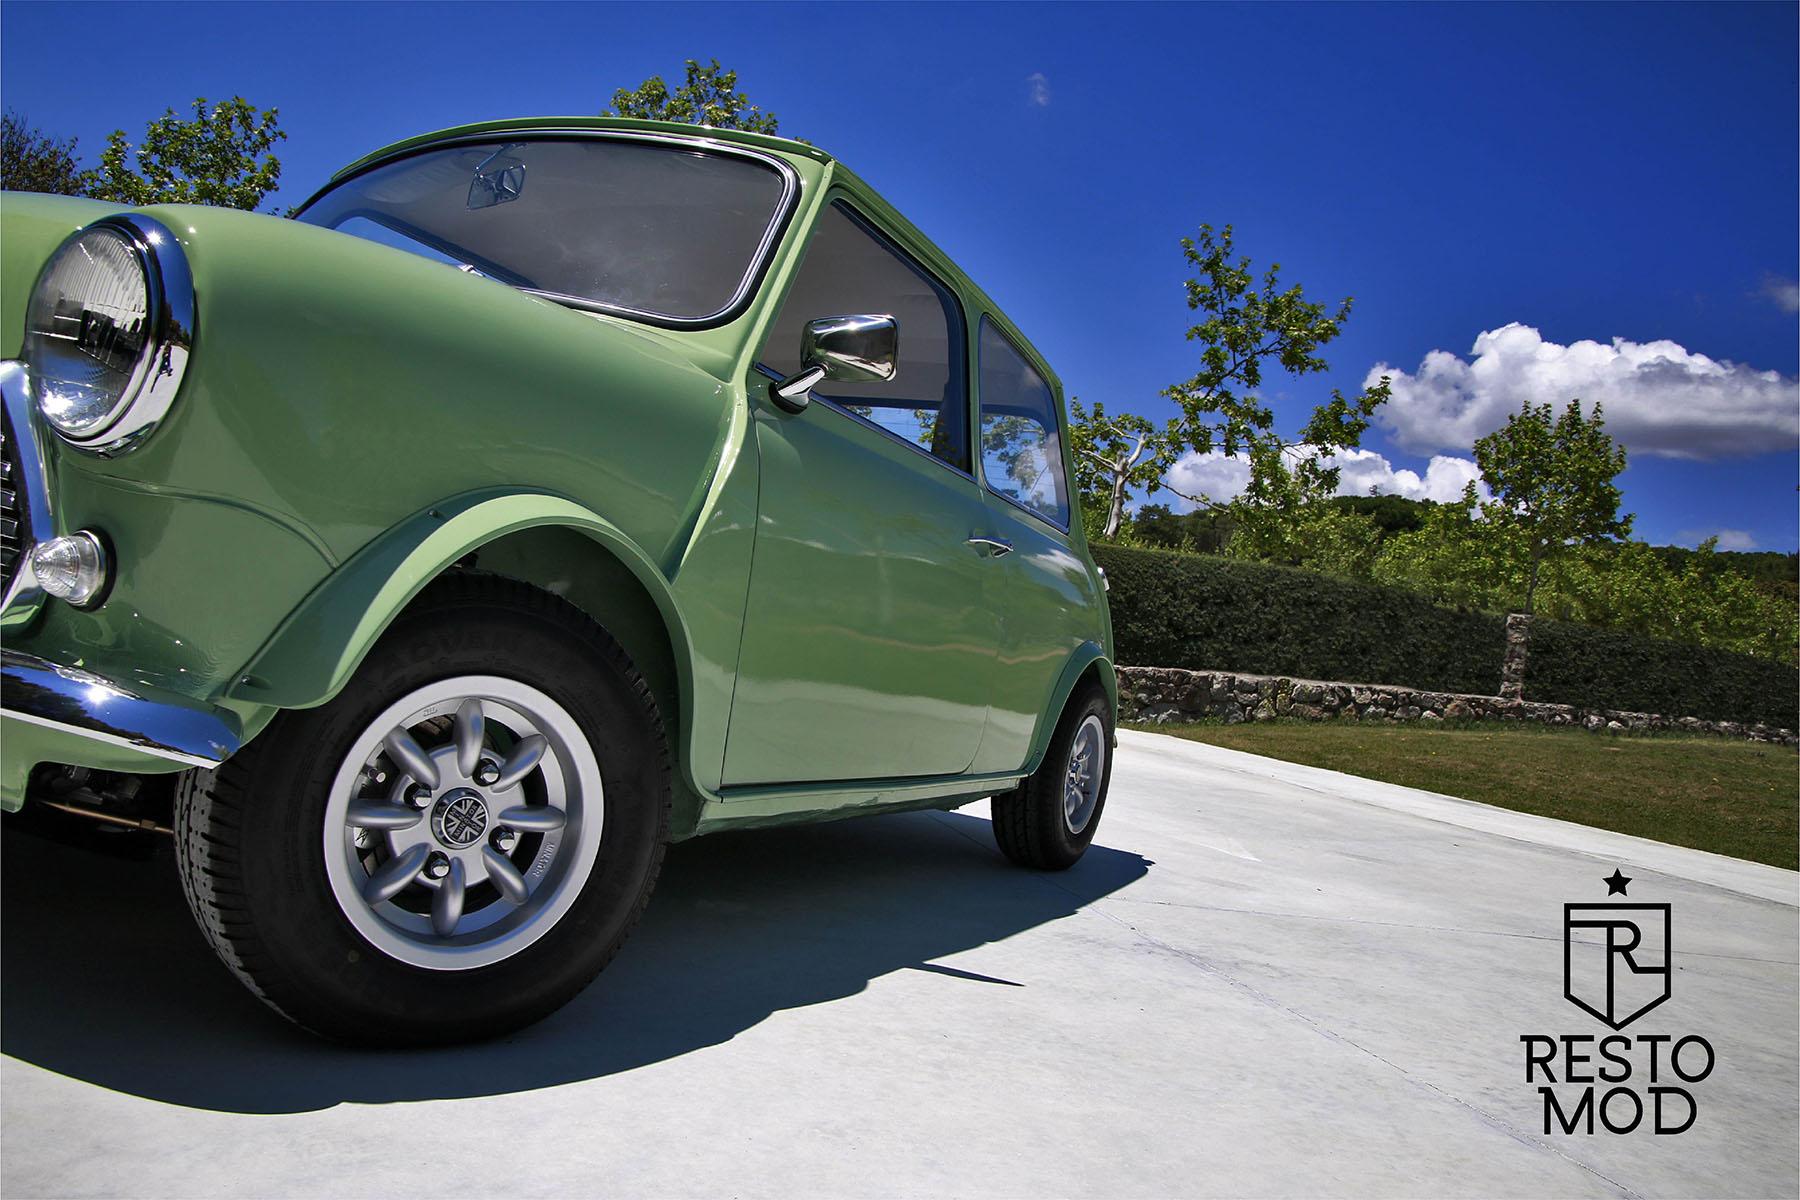 Mini with a Turbo 1 0 L EcoBoost Inline-Three – Engine Swap